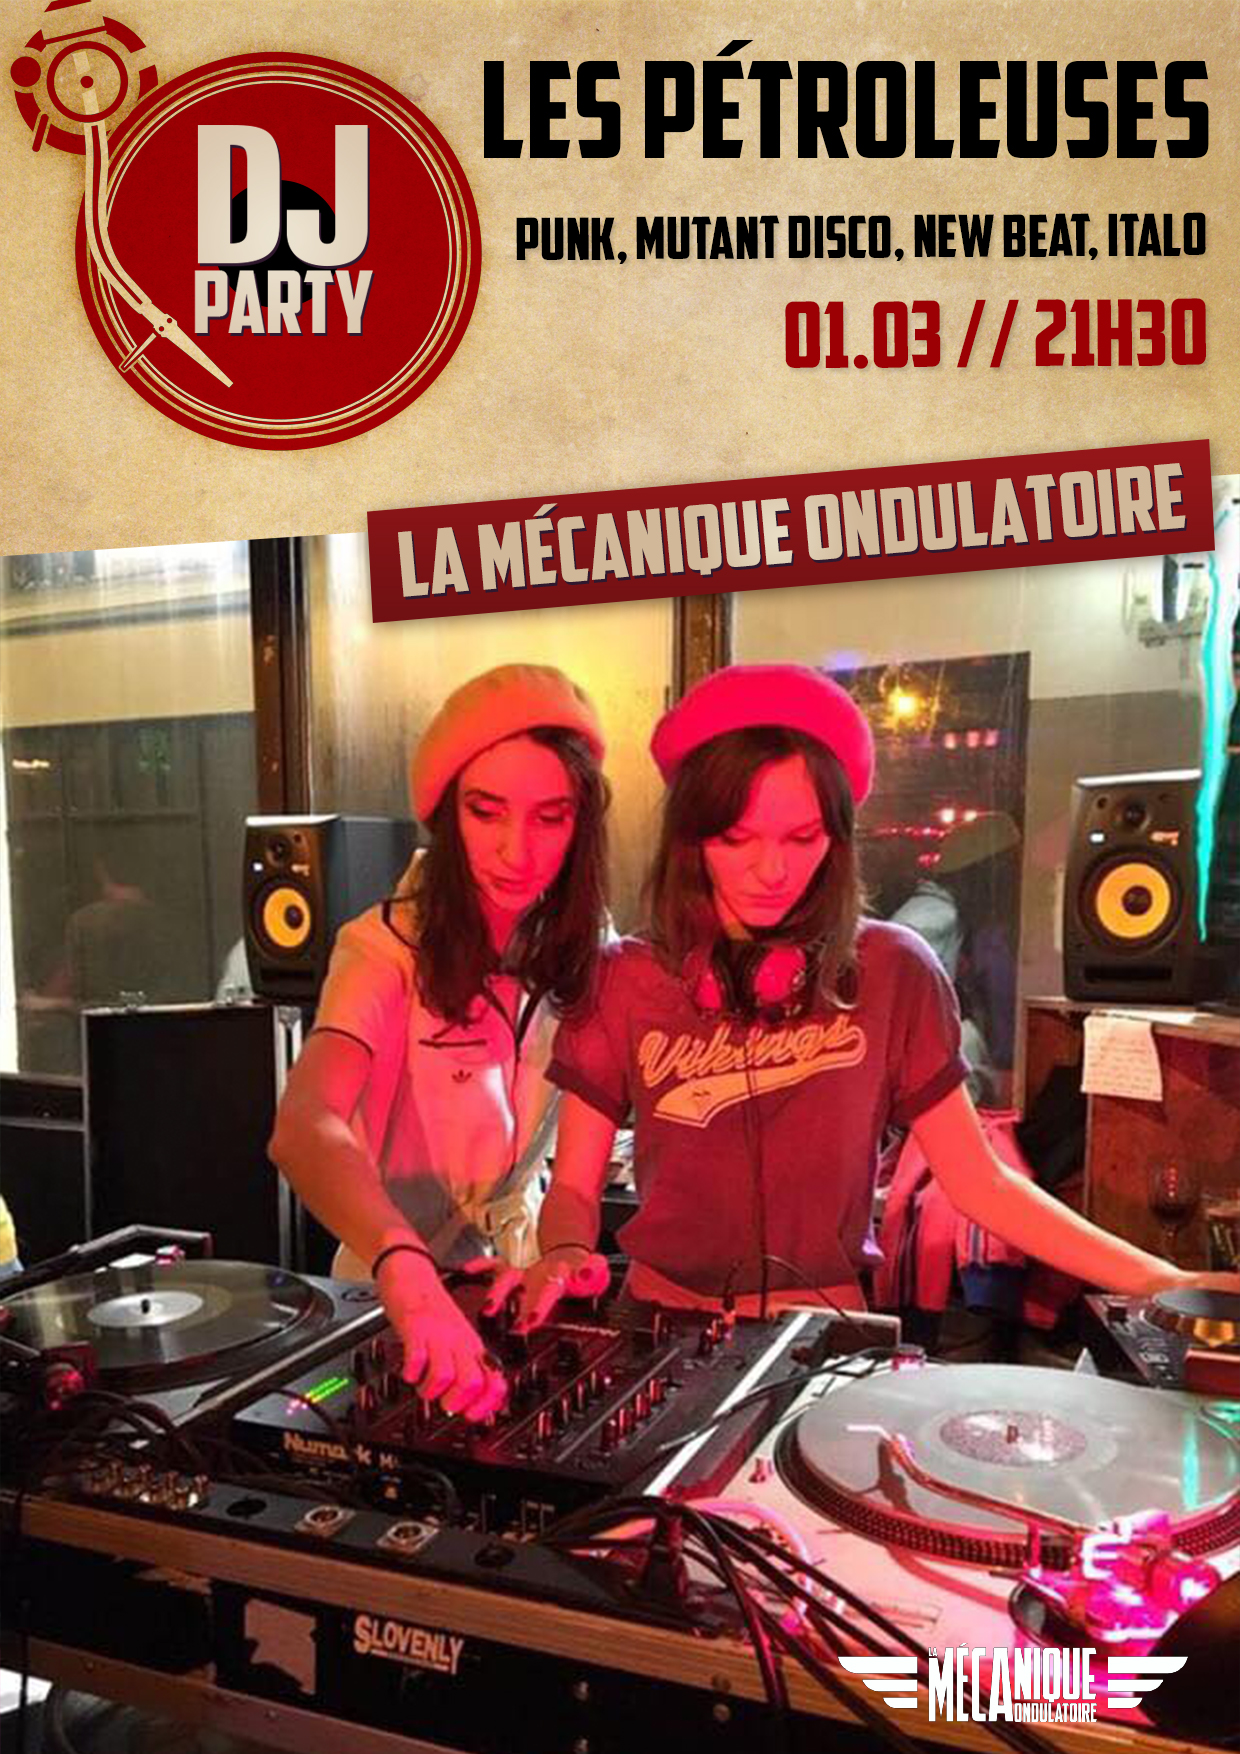 LES PETROLEUSES DJ SET // 01.03